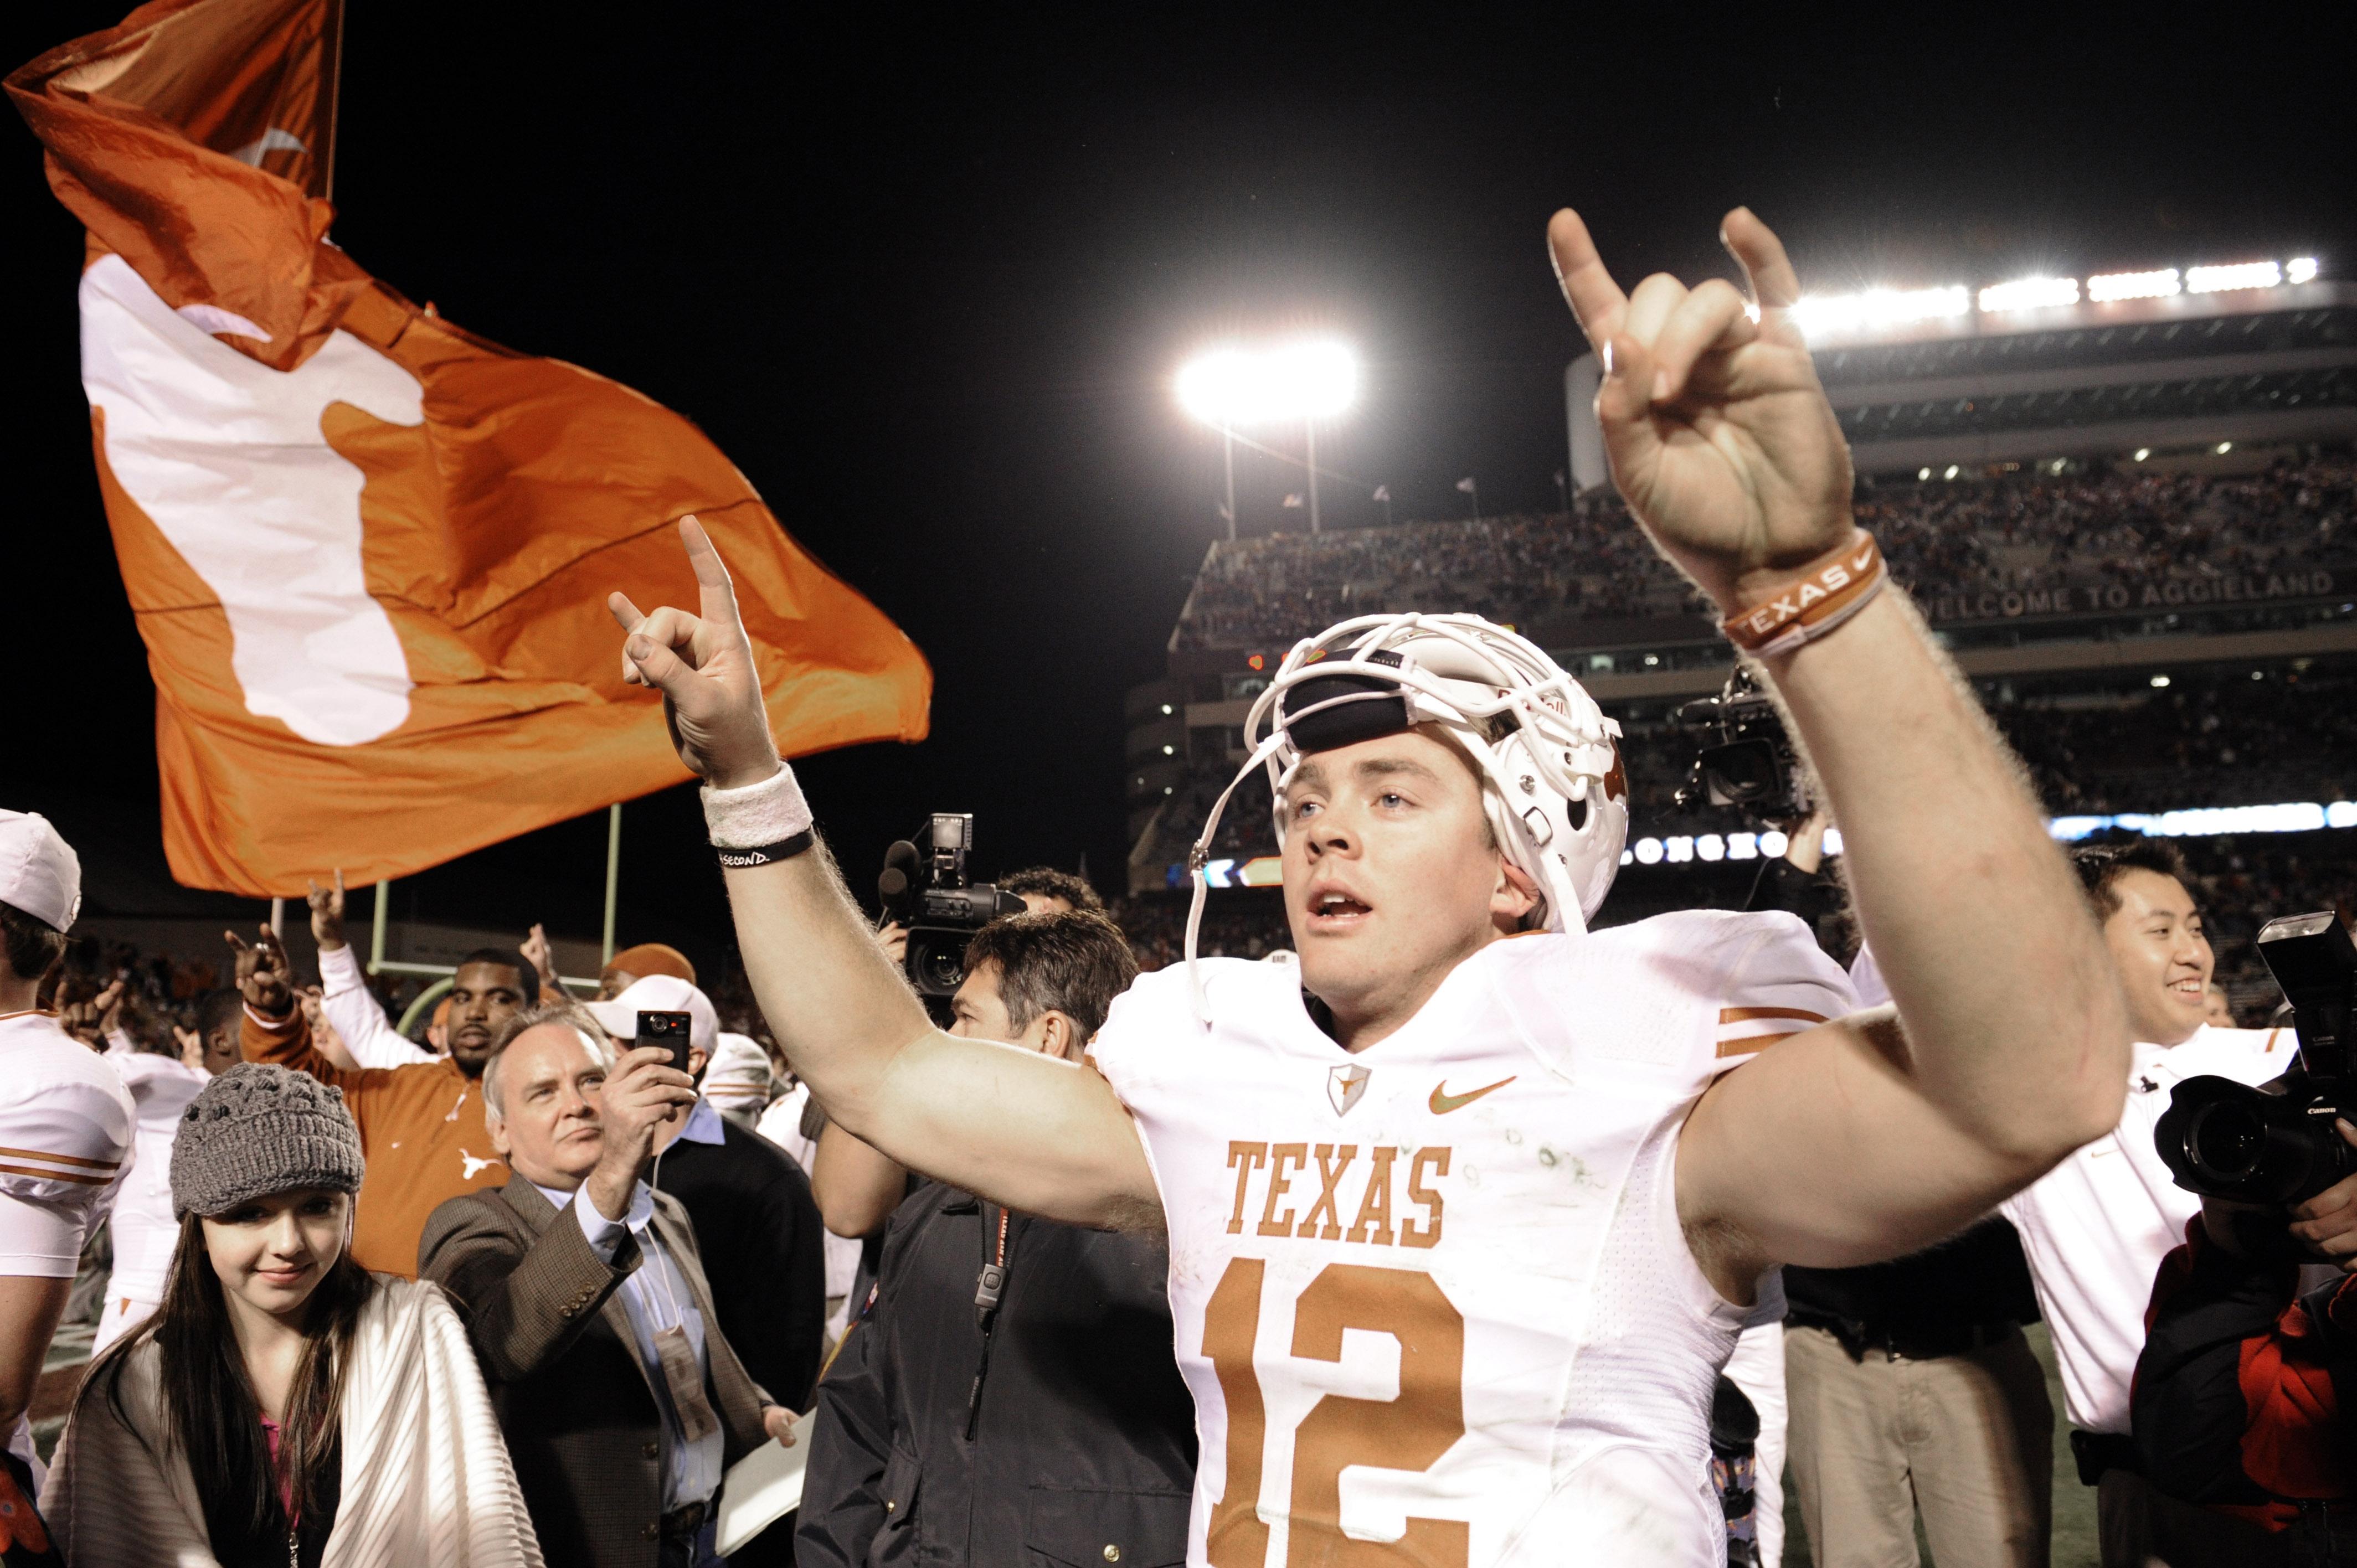 Texas quarterback Colt McCoy (12) celebrates after their NCAA college football game against Texas A&M Thursday, Nov. 26, 2009 in College Station, Texas. Texas beat Texas A&M 49-39. (AP Photo/Dave Einsel)